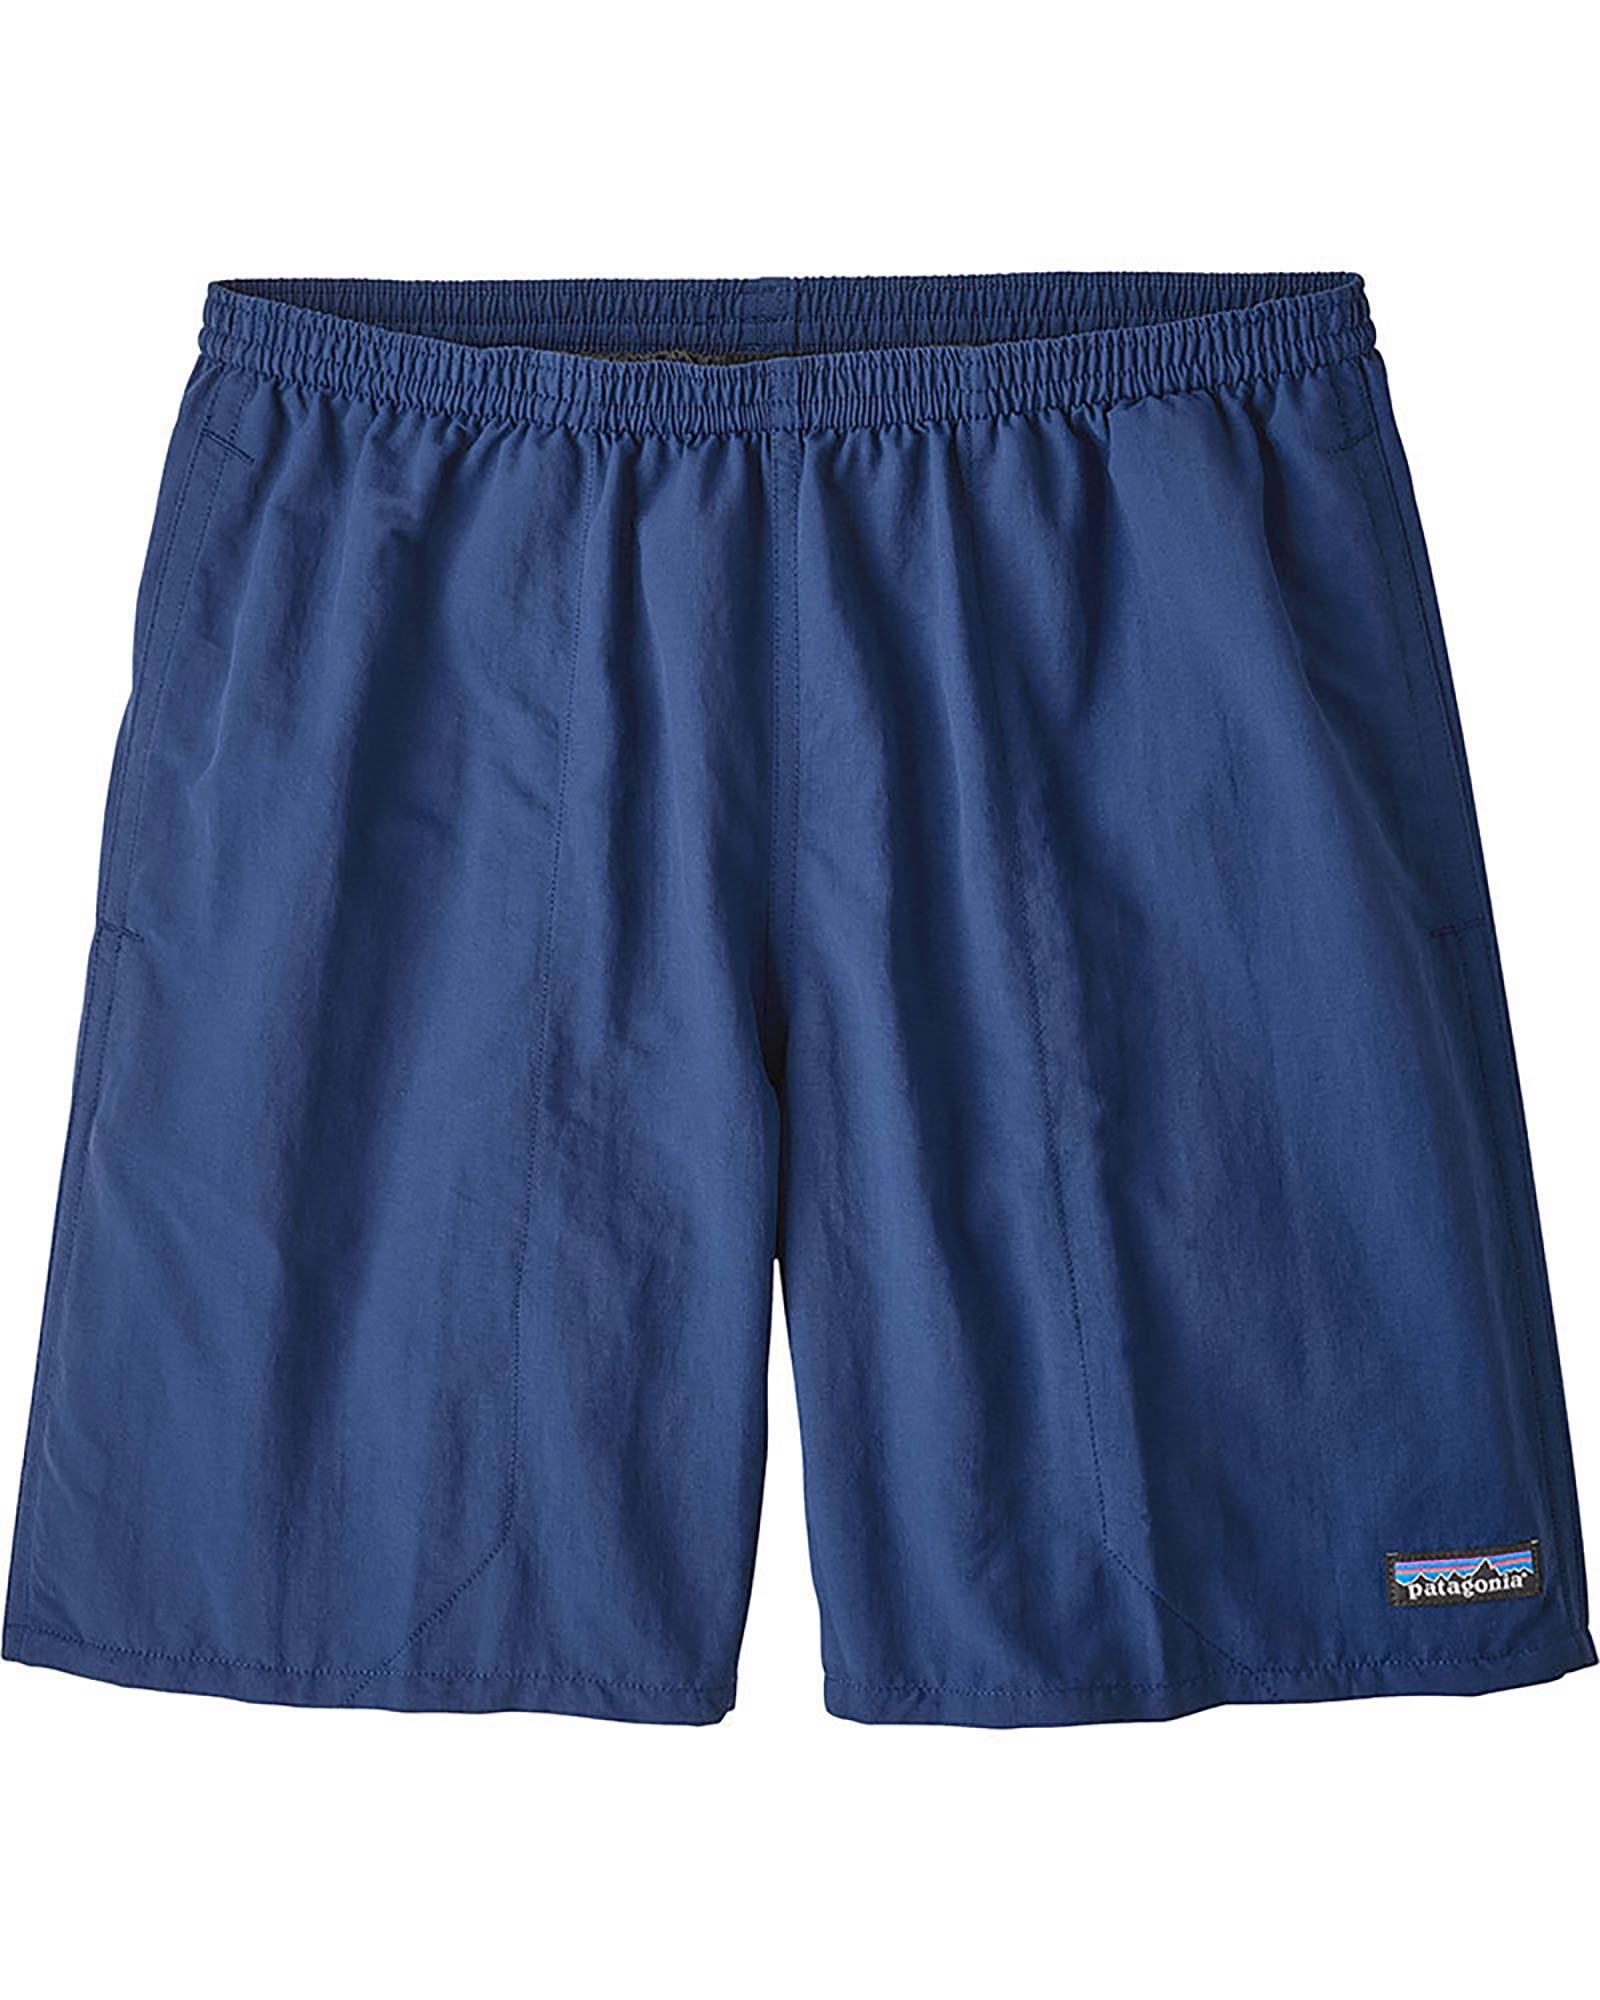 Patagonia Baggies Men's Shorts 0